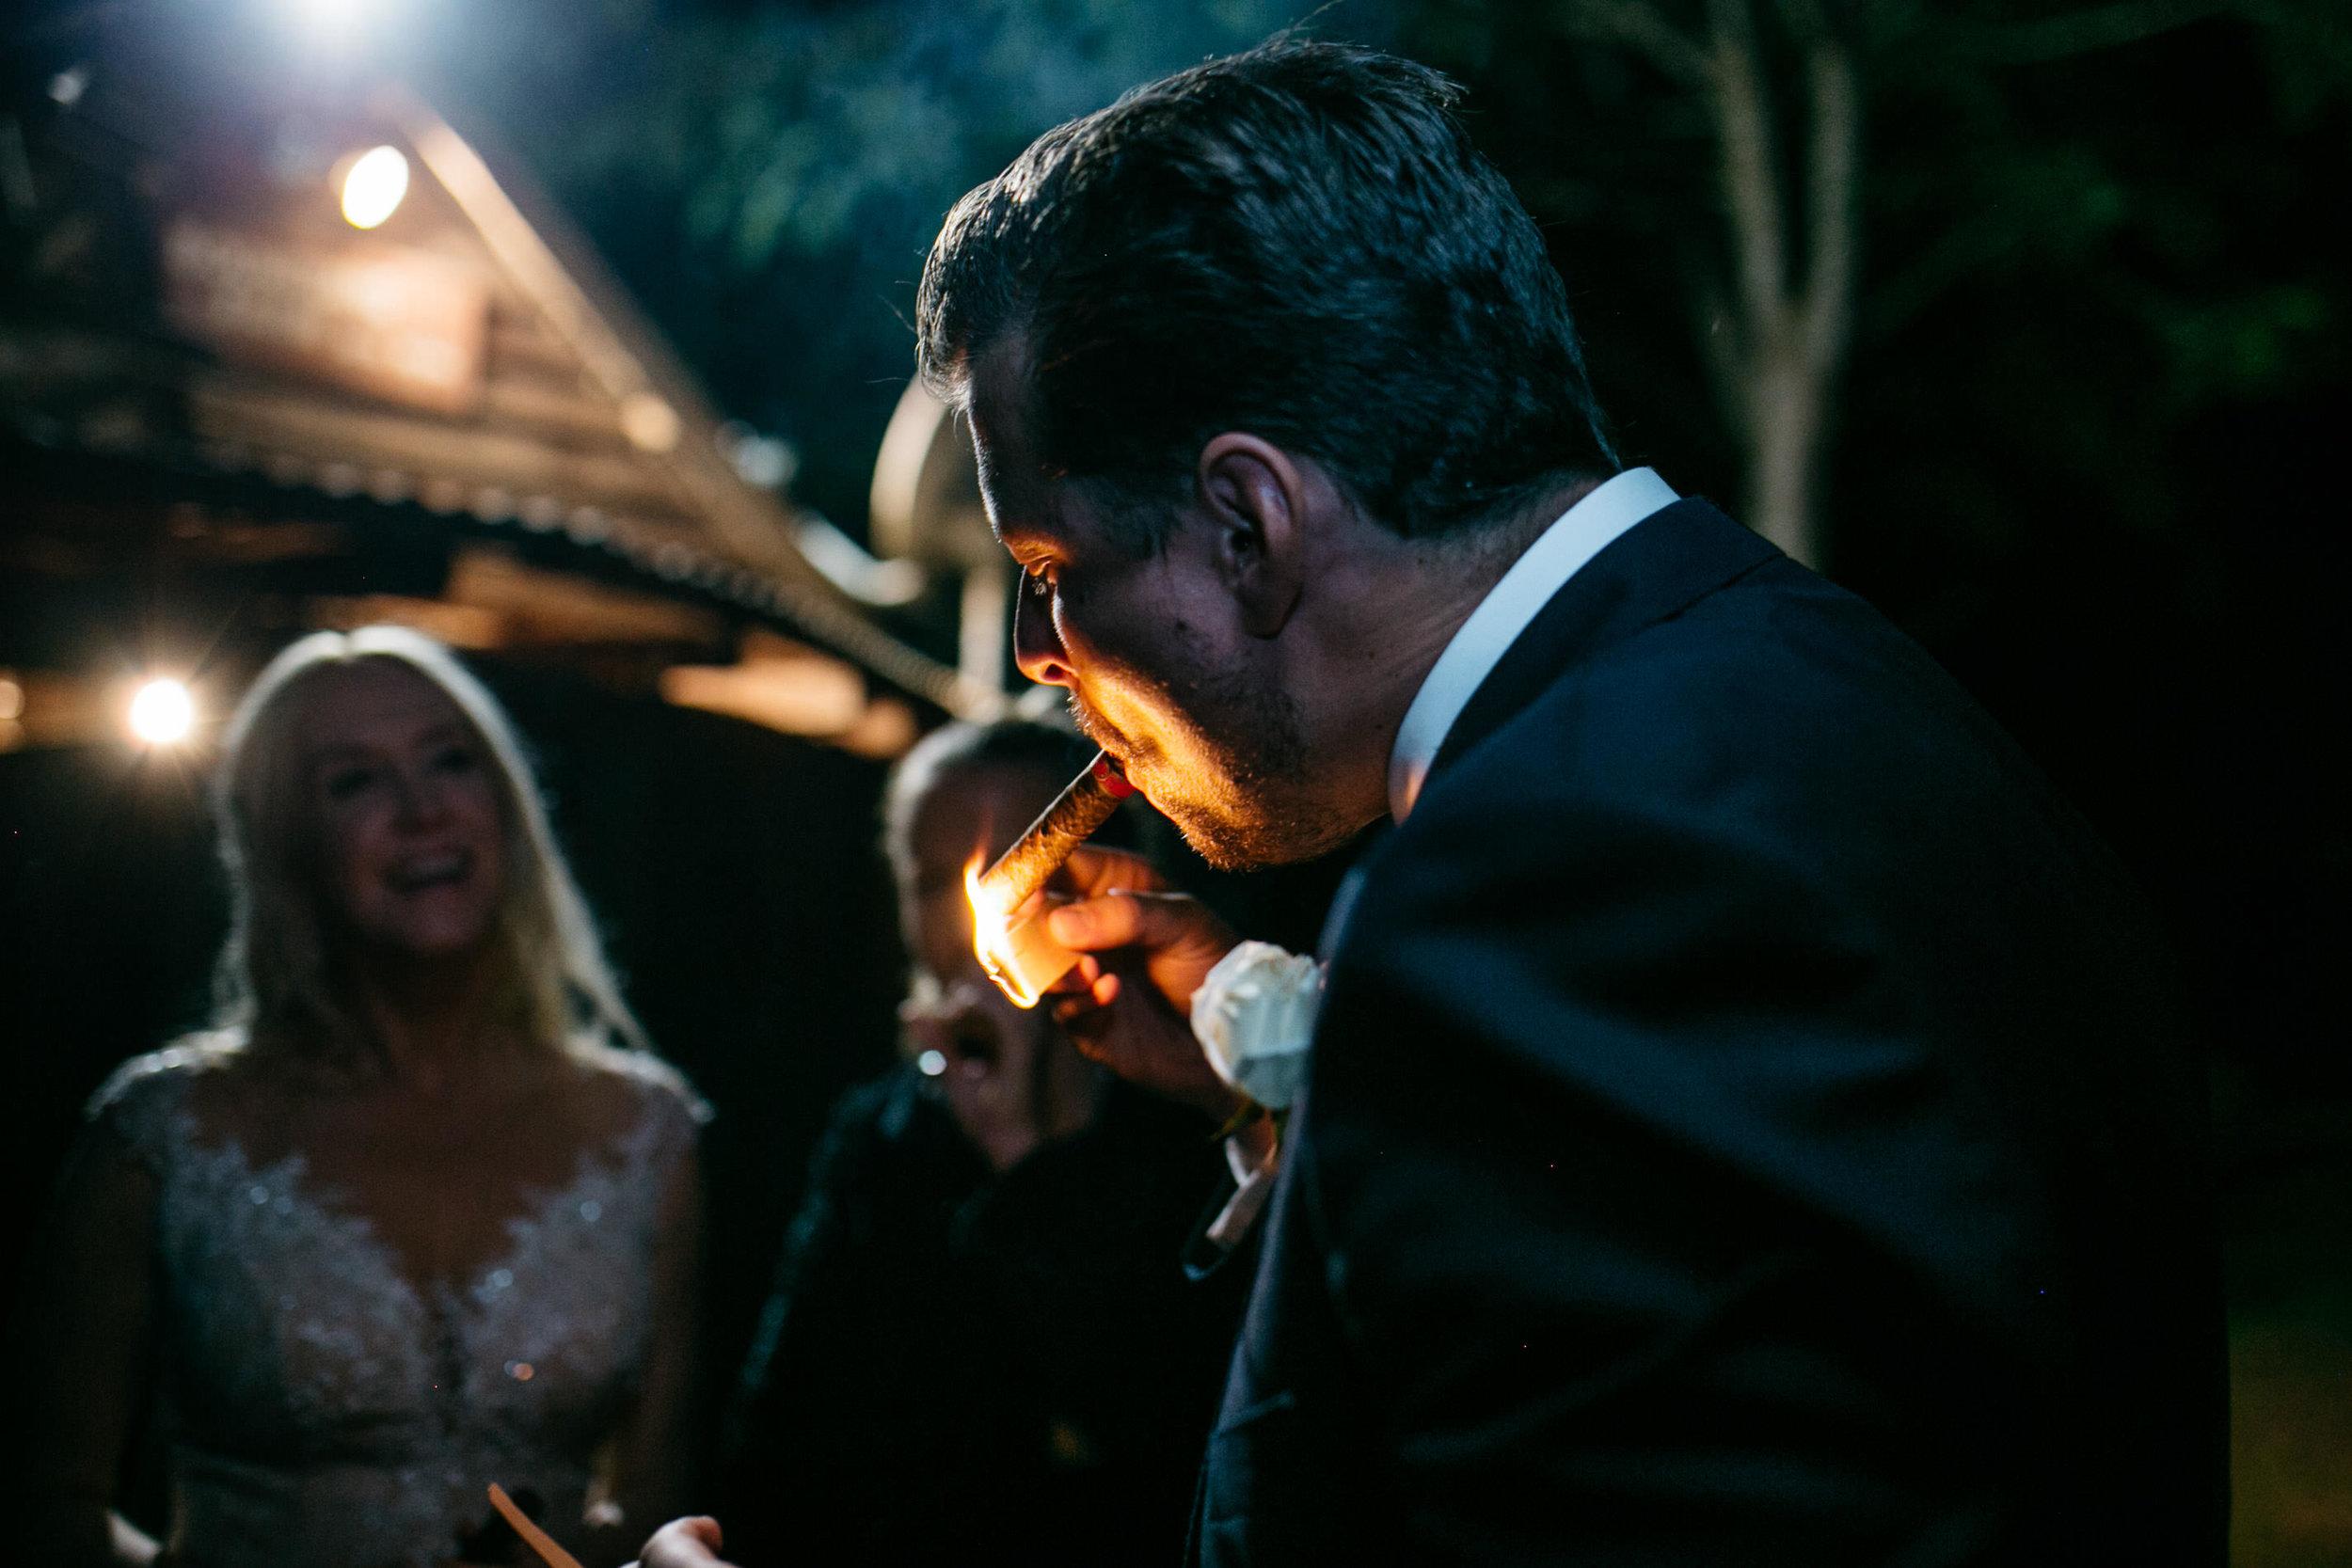 True North Photography_Boomerang Farm_Stacey and Isaac_Gold Coast Wedding_Barm Wedding_Hinterland Wedding-224.jpg